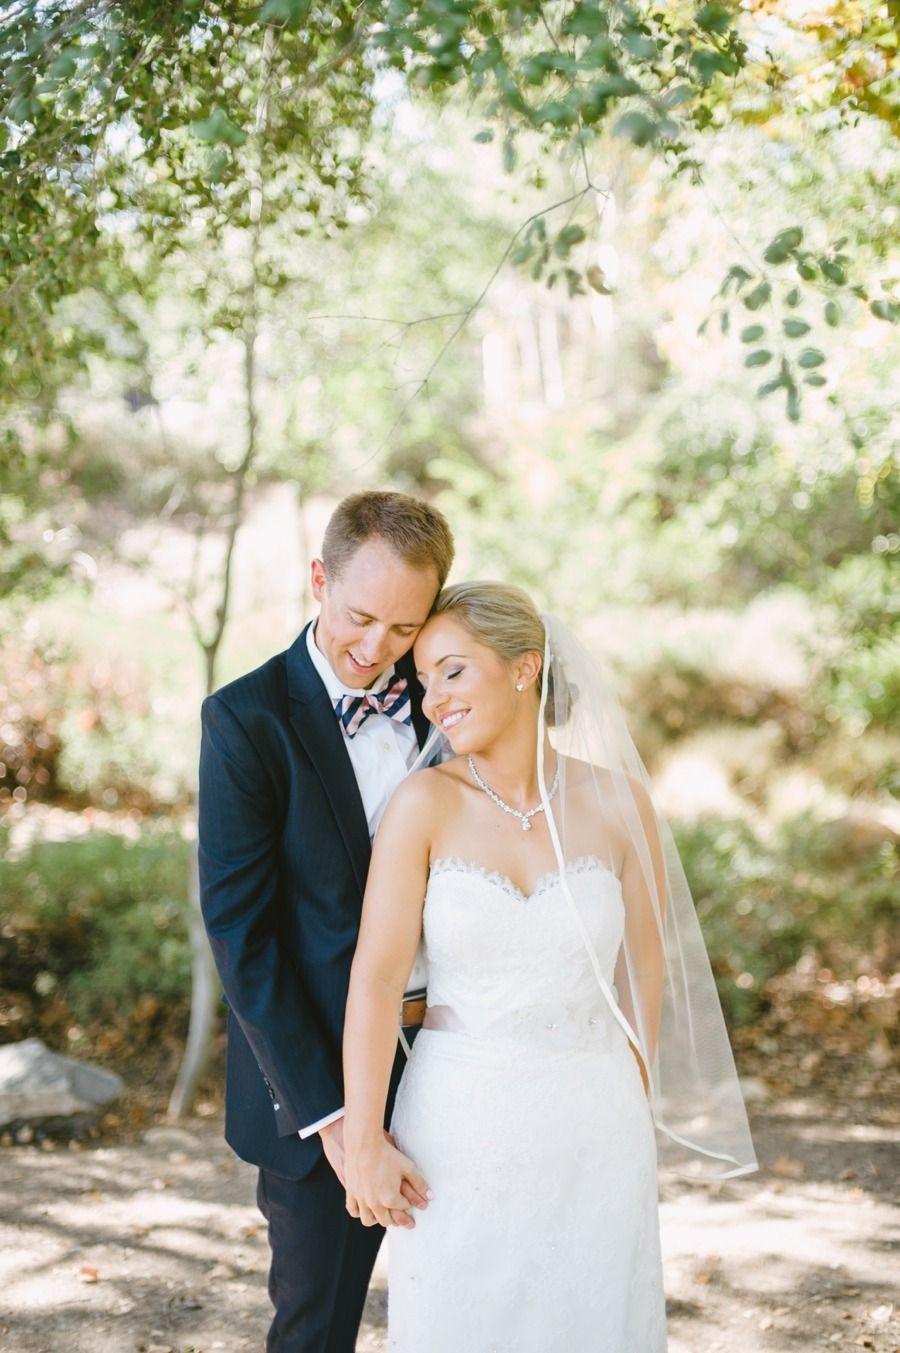 Photography: Sargeant Creative - www.sargeantcreative.com  Read More: http://www.stylemepretty.com/california-weddings/2015/04/29/romantic-orange-county-wedding/